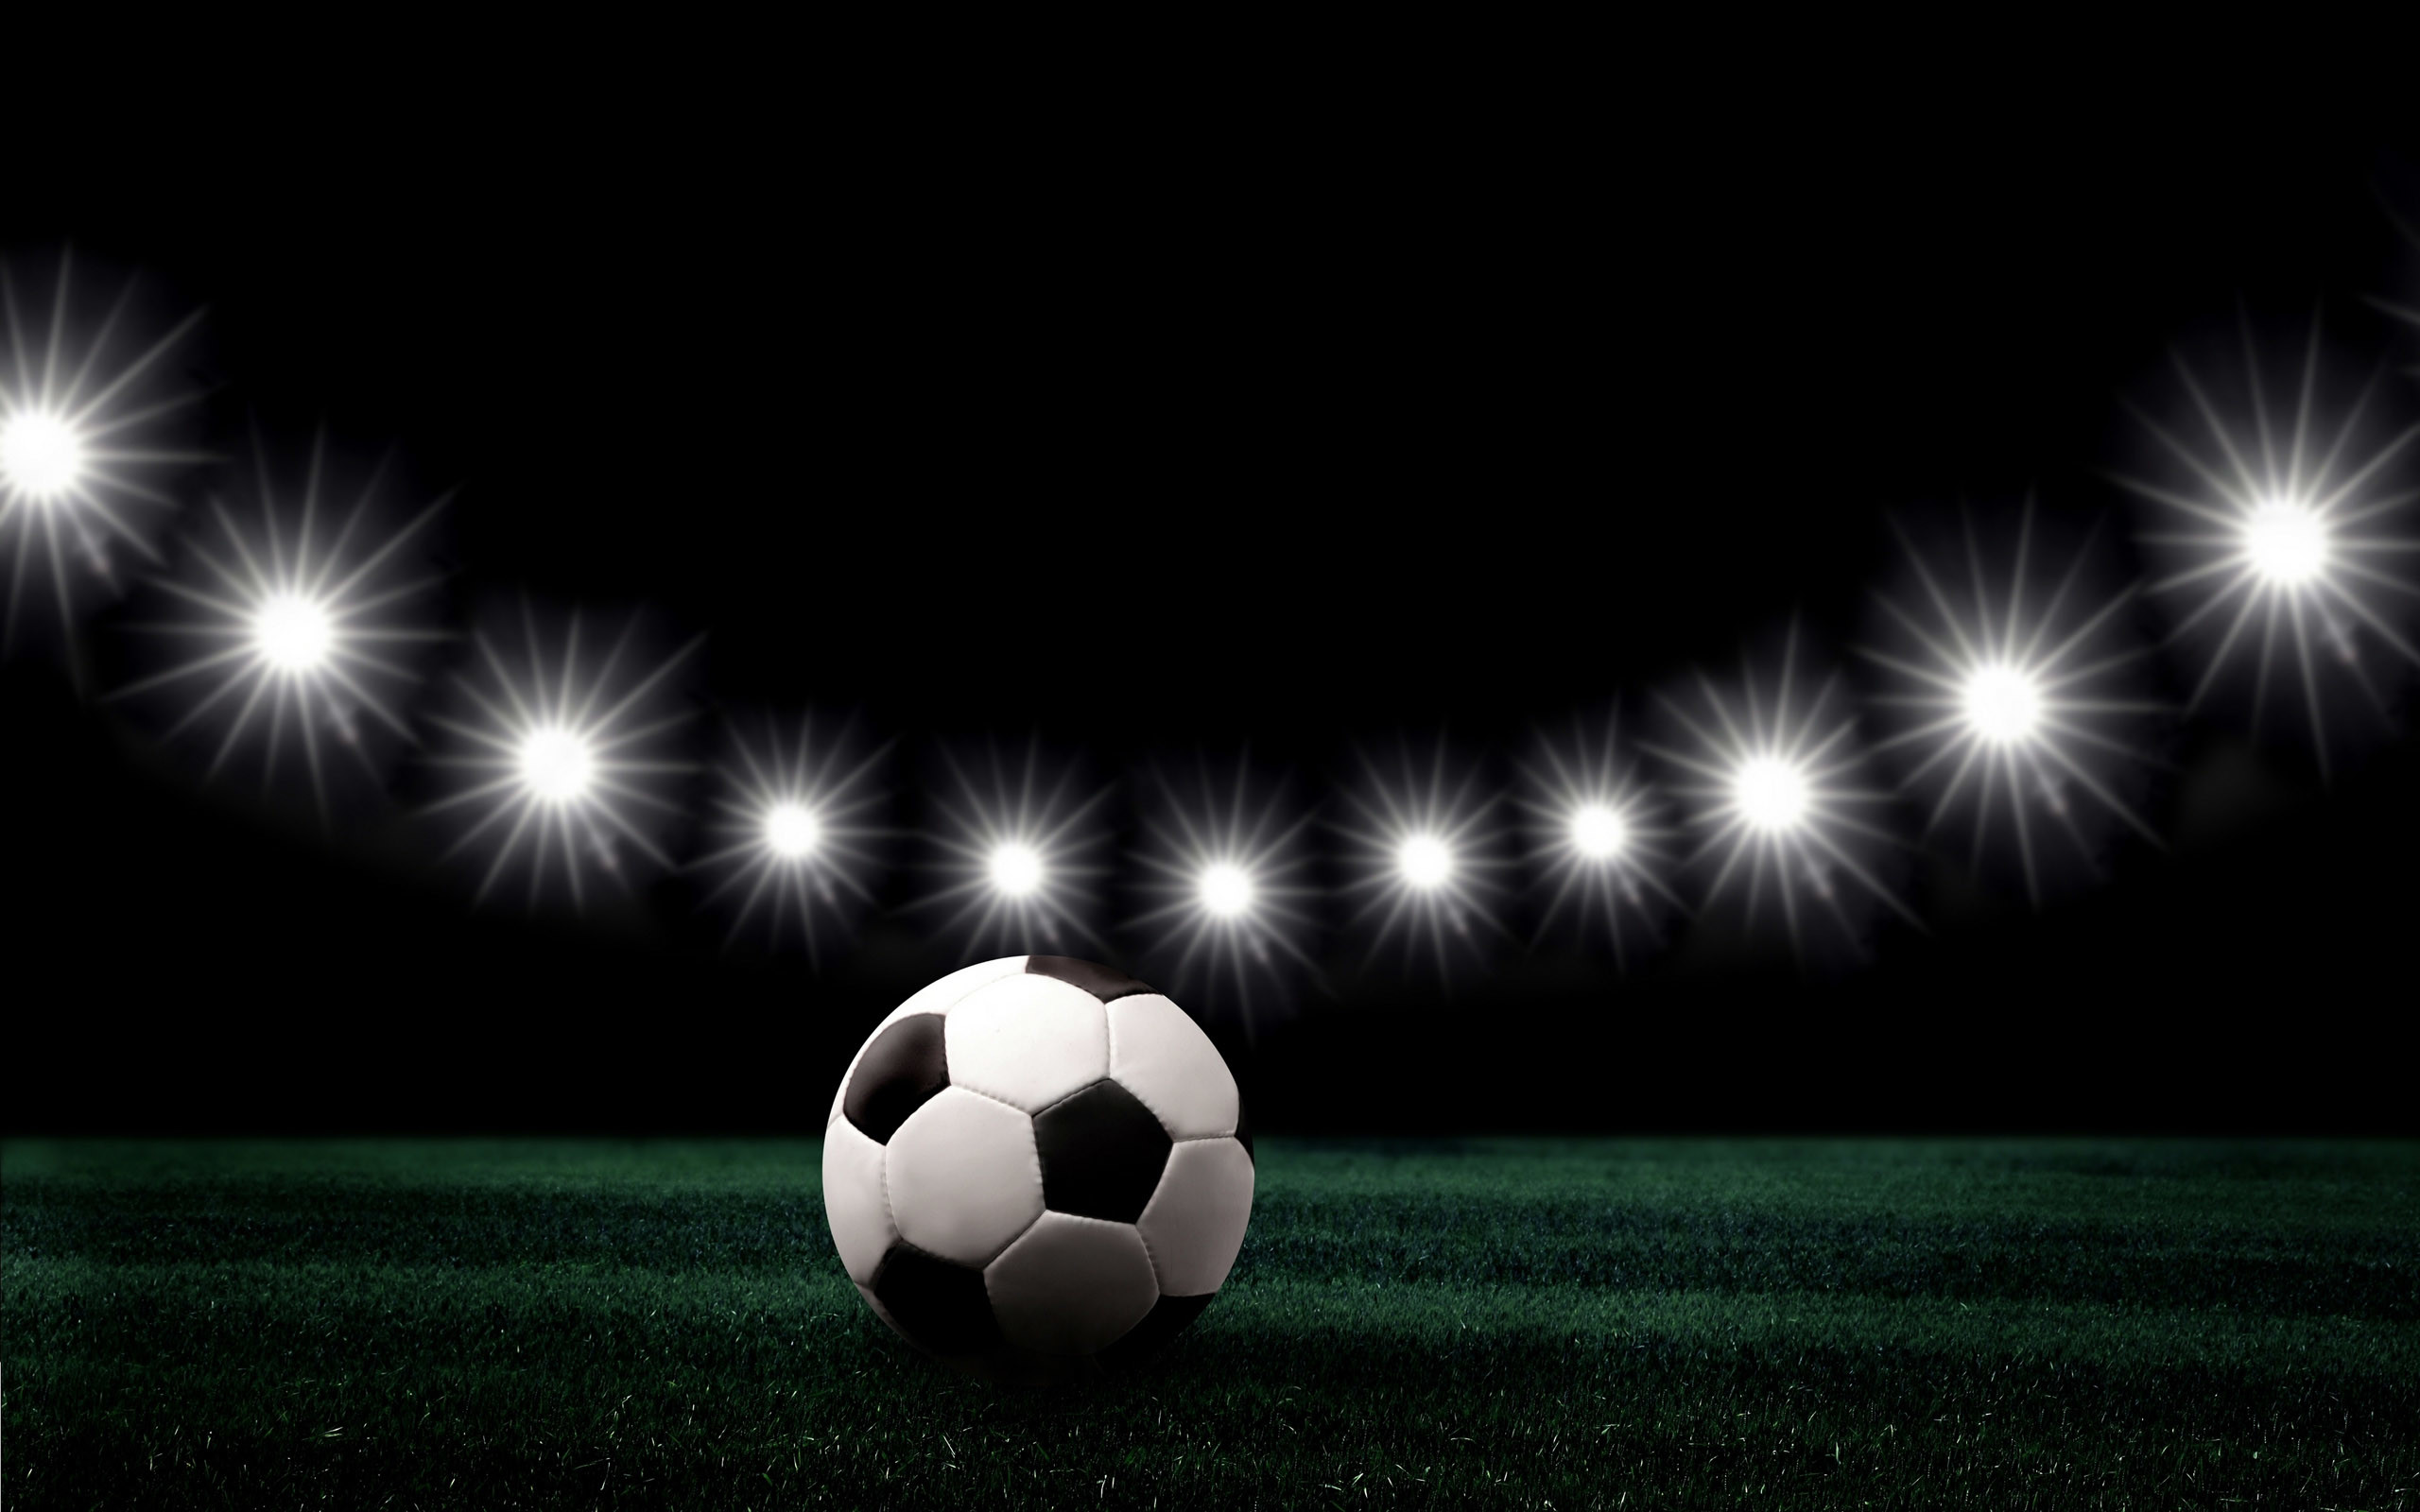 wallpaper of soccer, wallpaper soccer ball